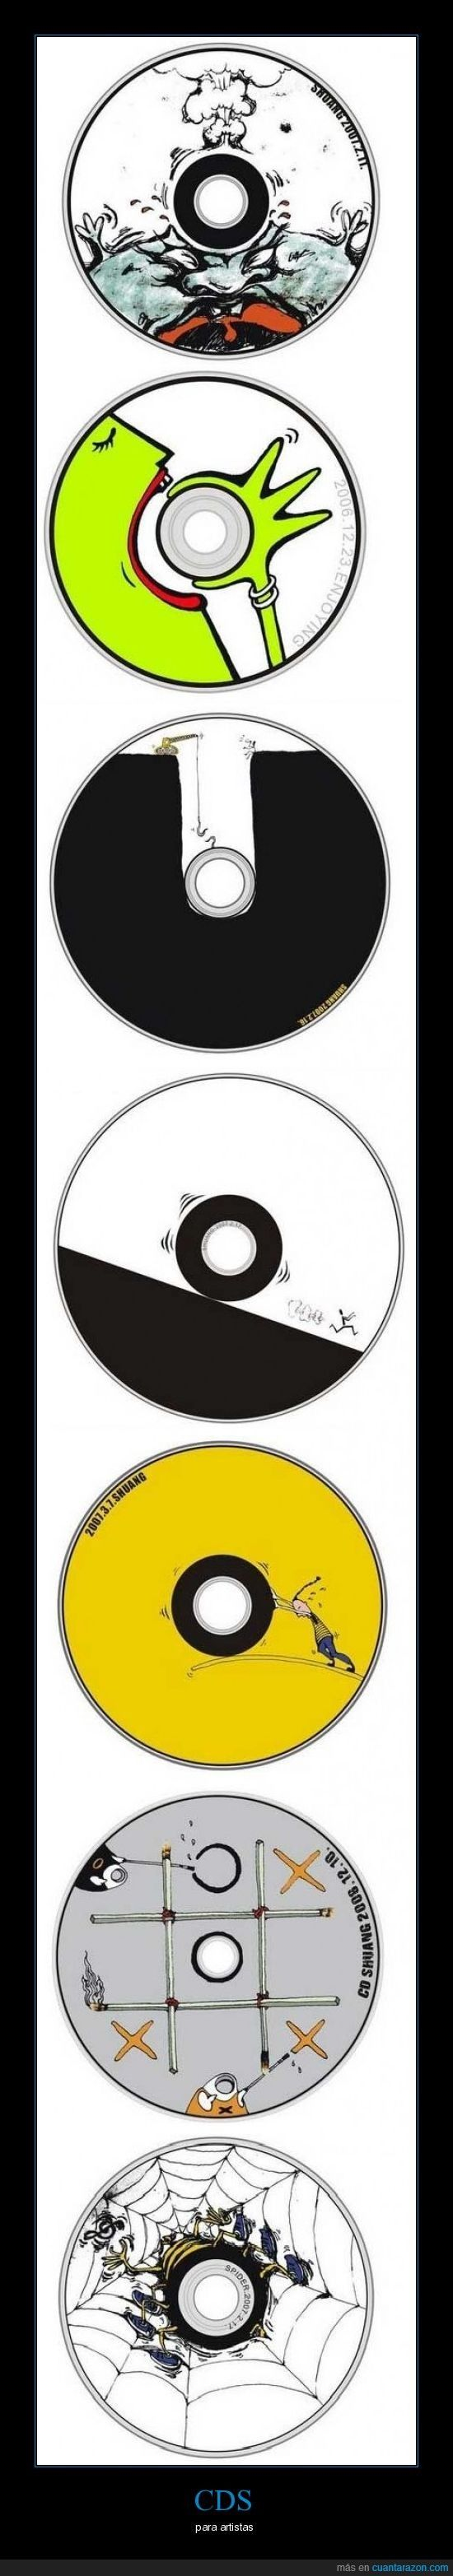 CDS - para artistas